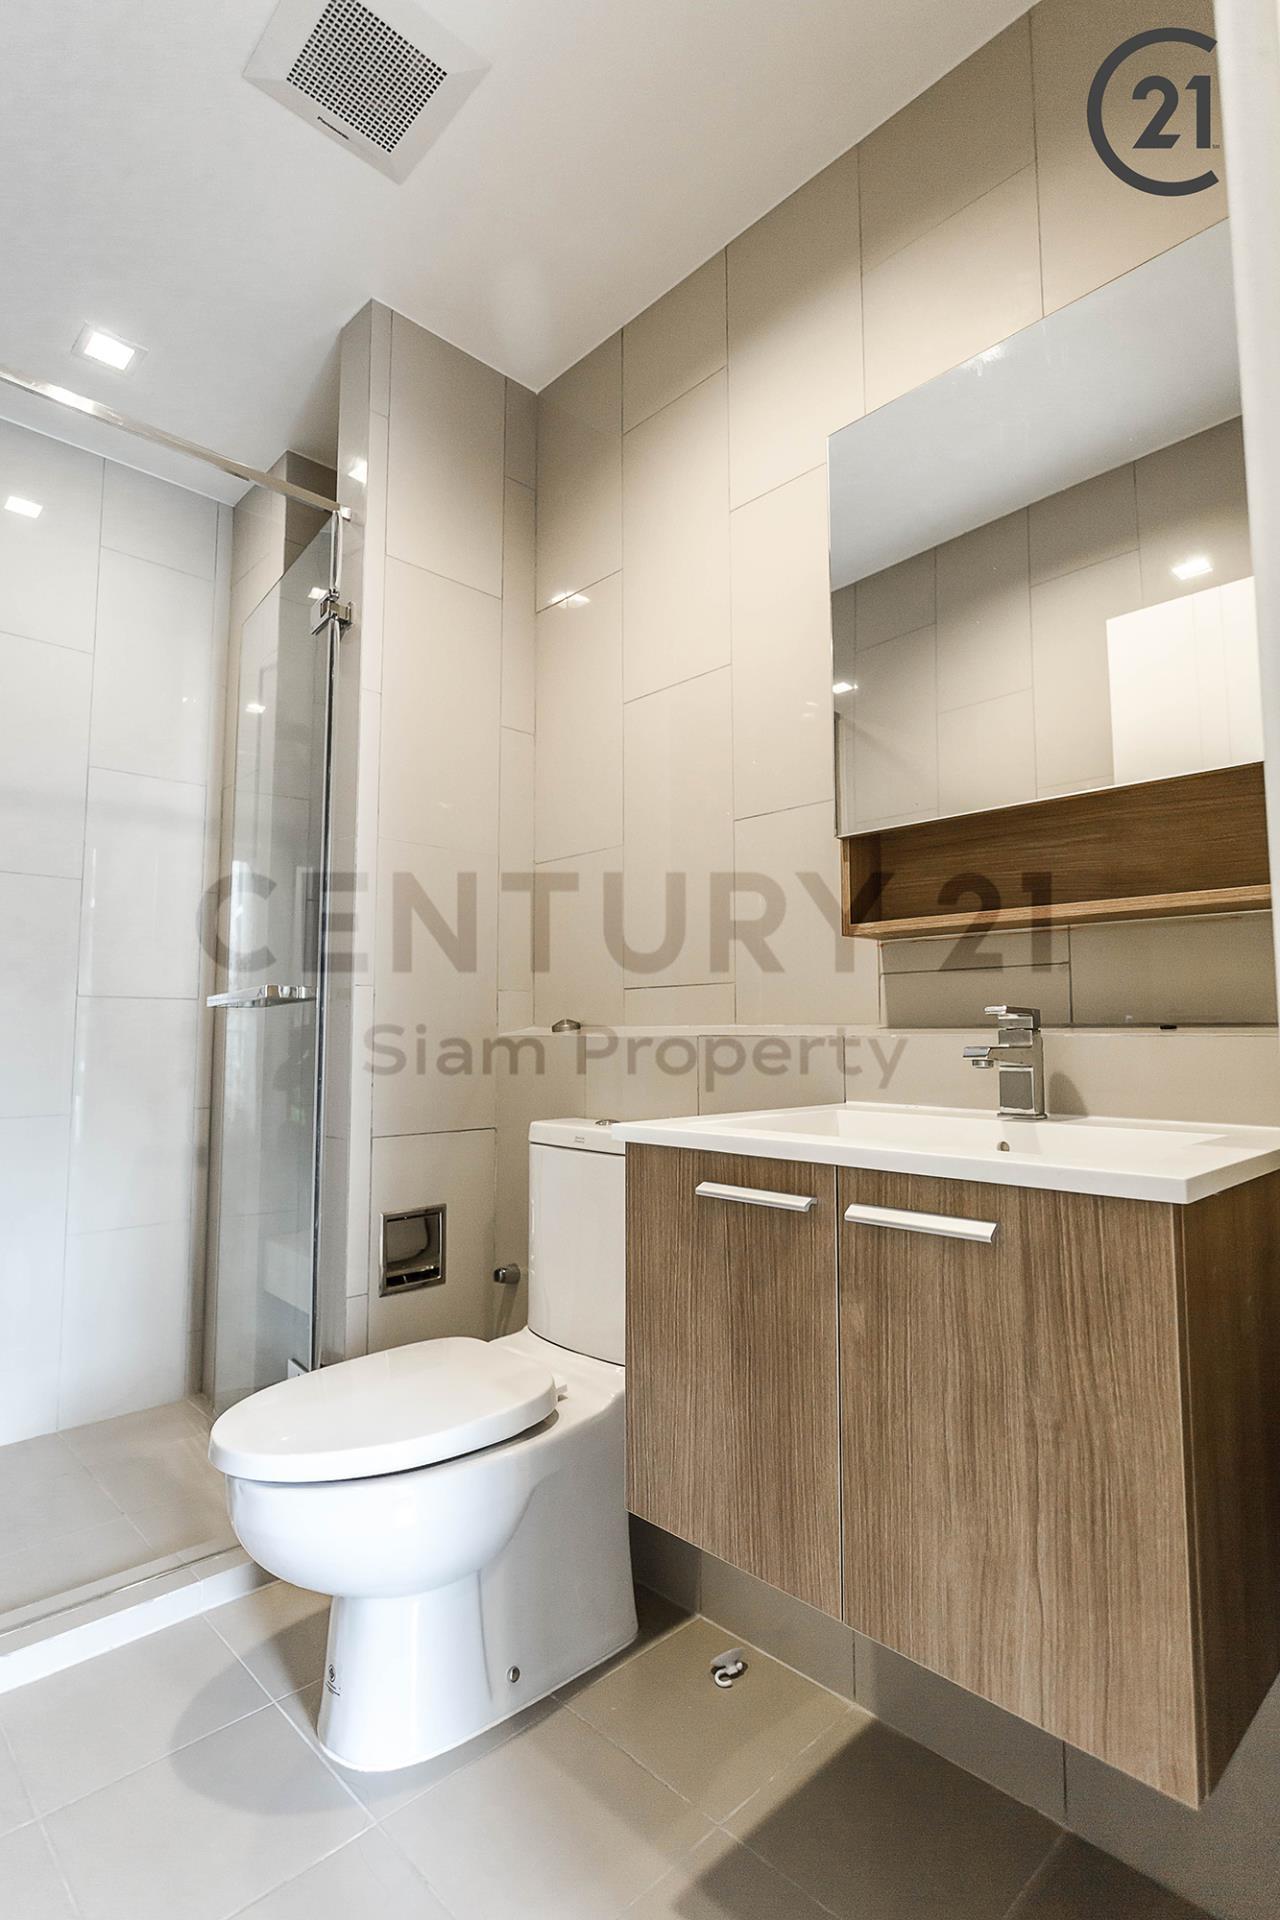 Century21 Siam Property Agency's Hasu Haus  12